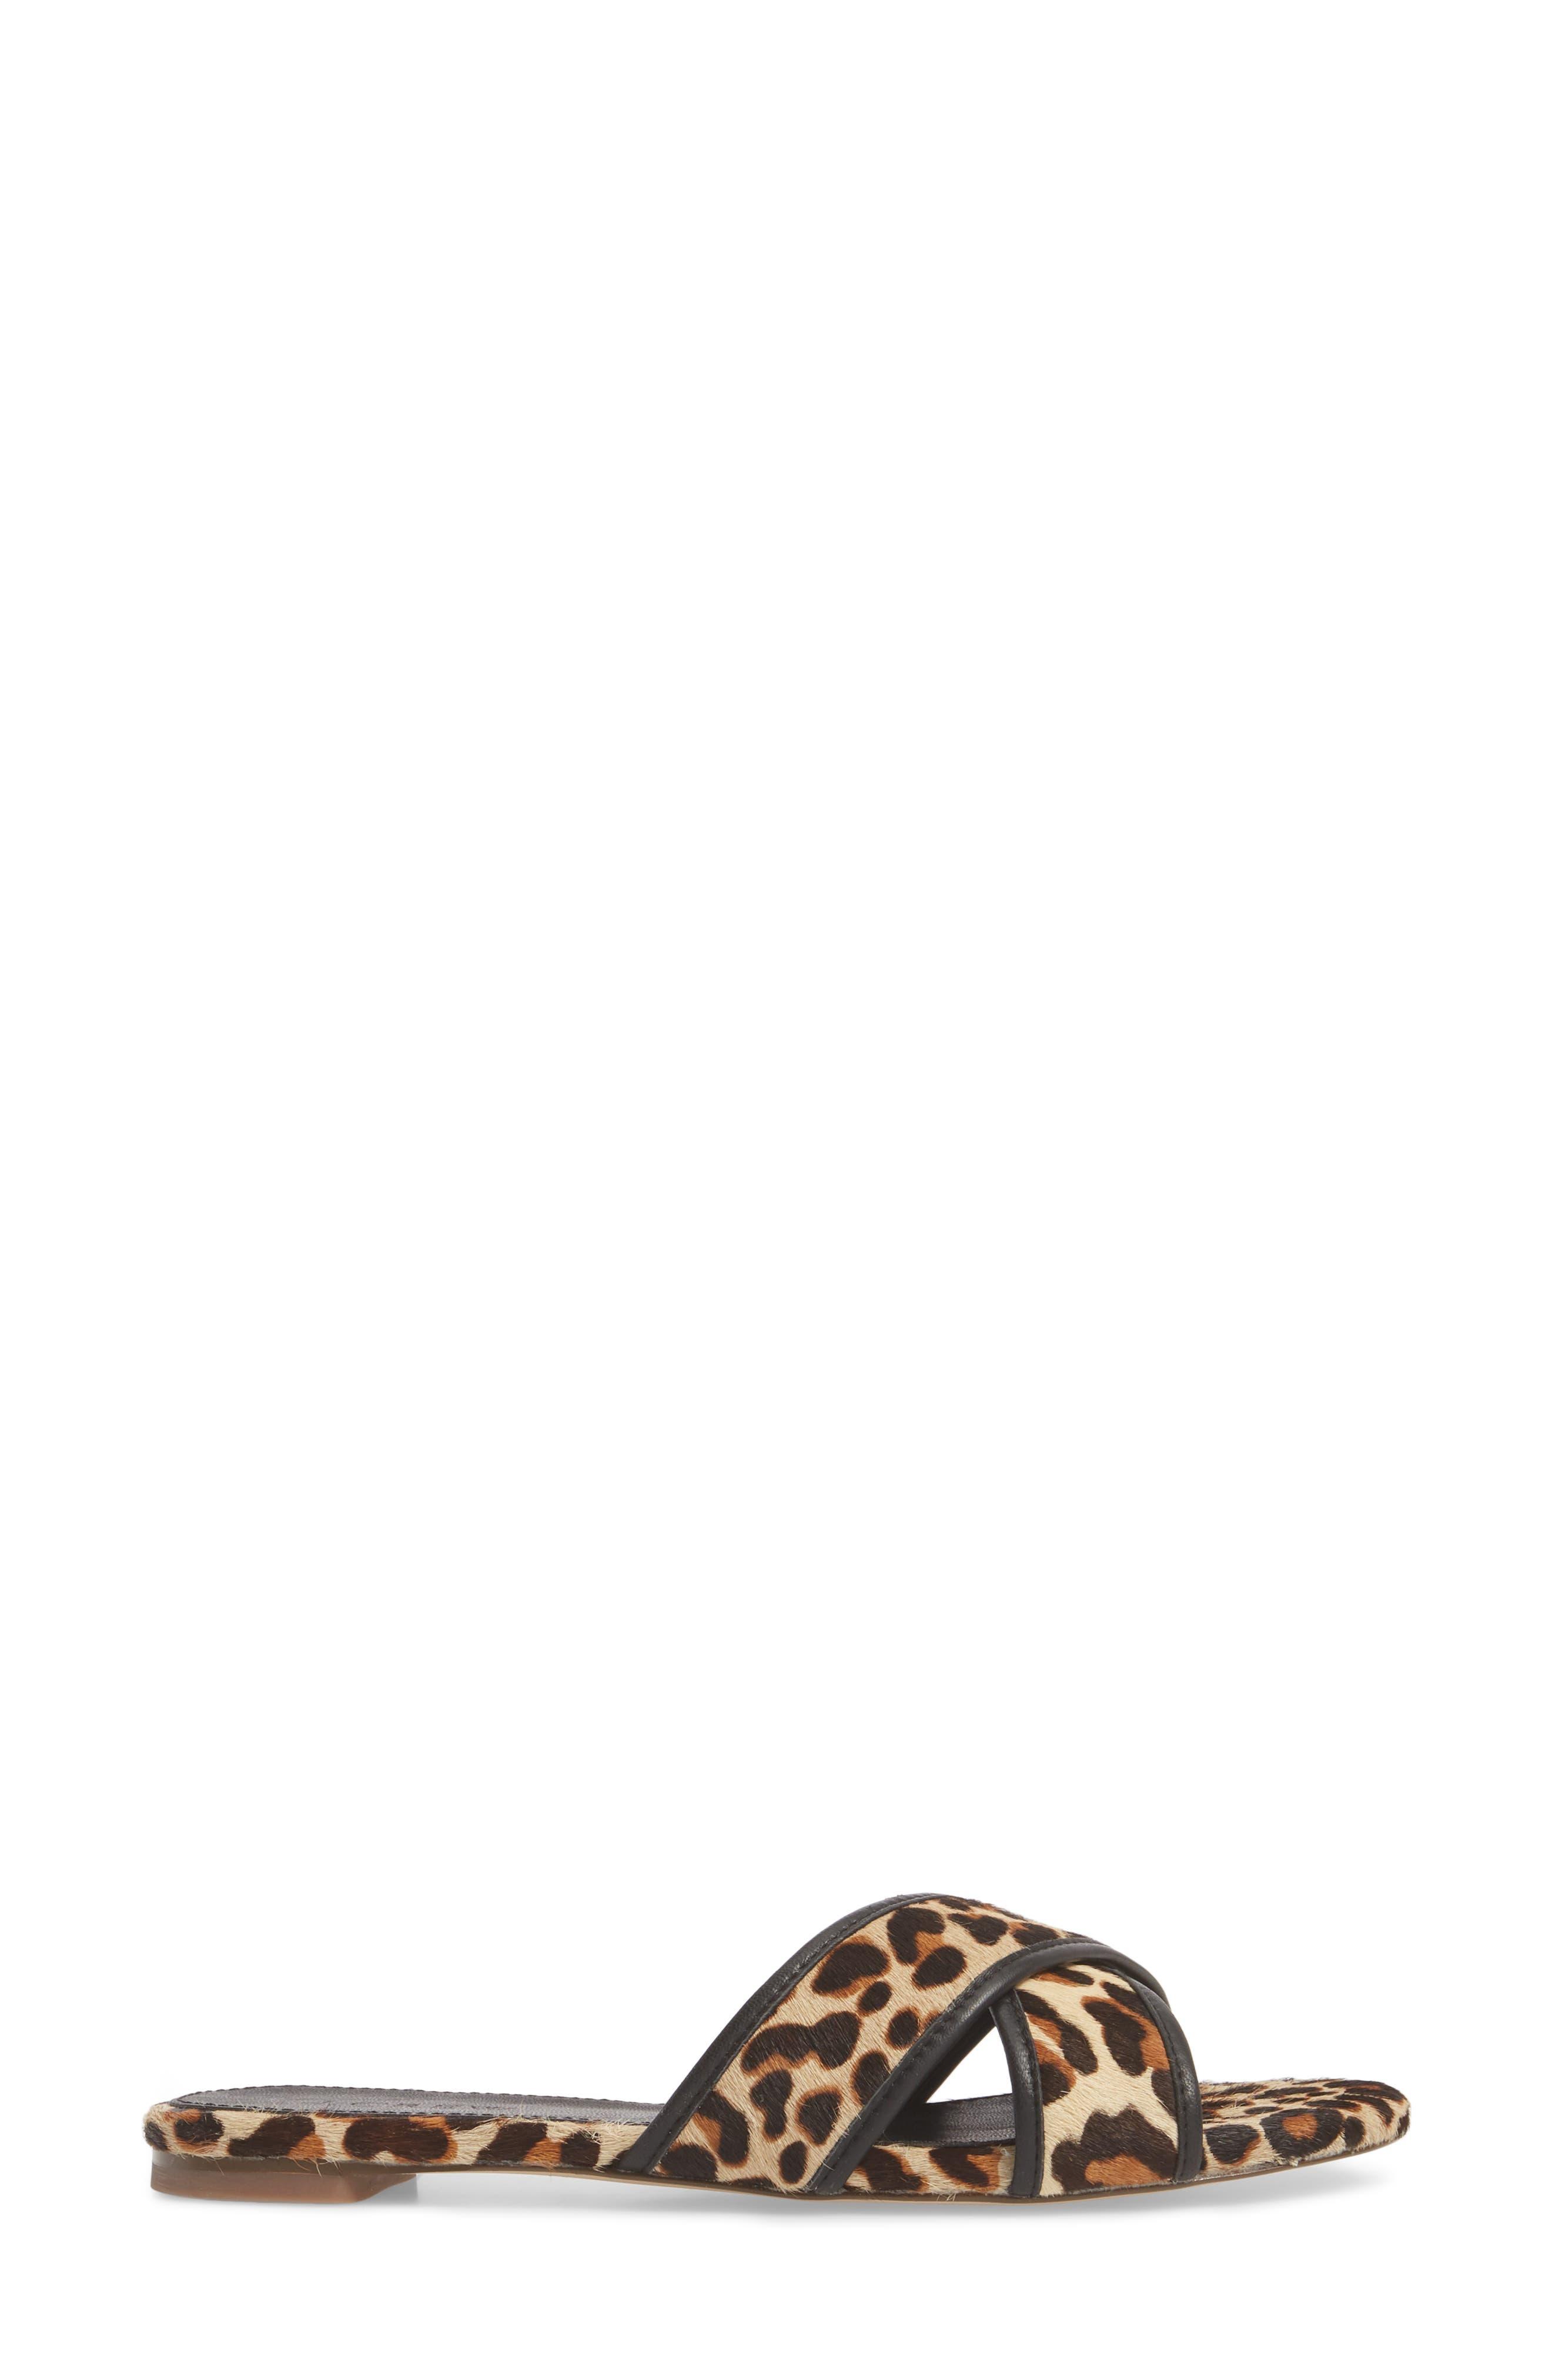 Cora Genuine Calf Hair Slide Sandal,                             Alternate thumbnail 4, color,                             Chocolate Sepia